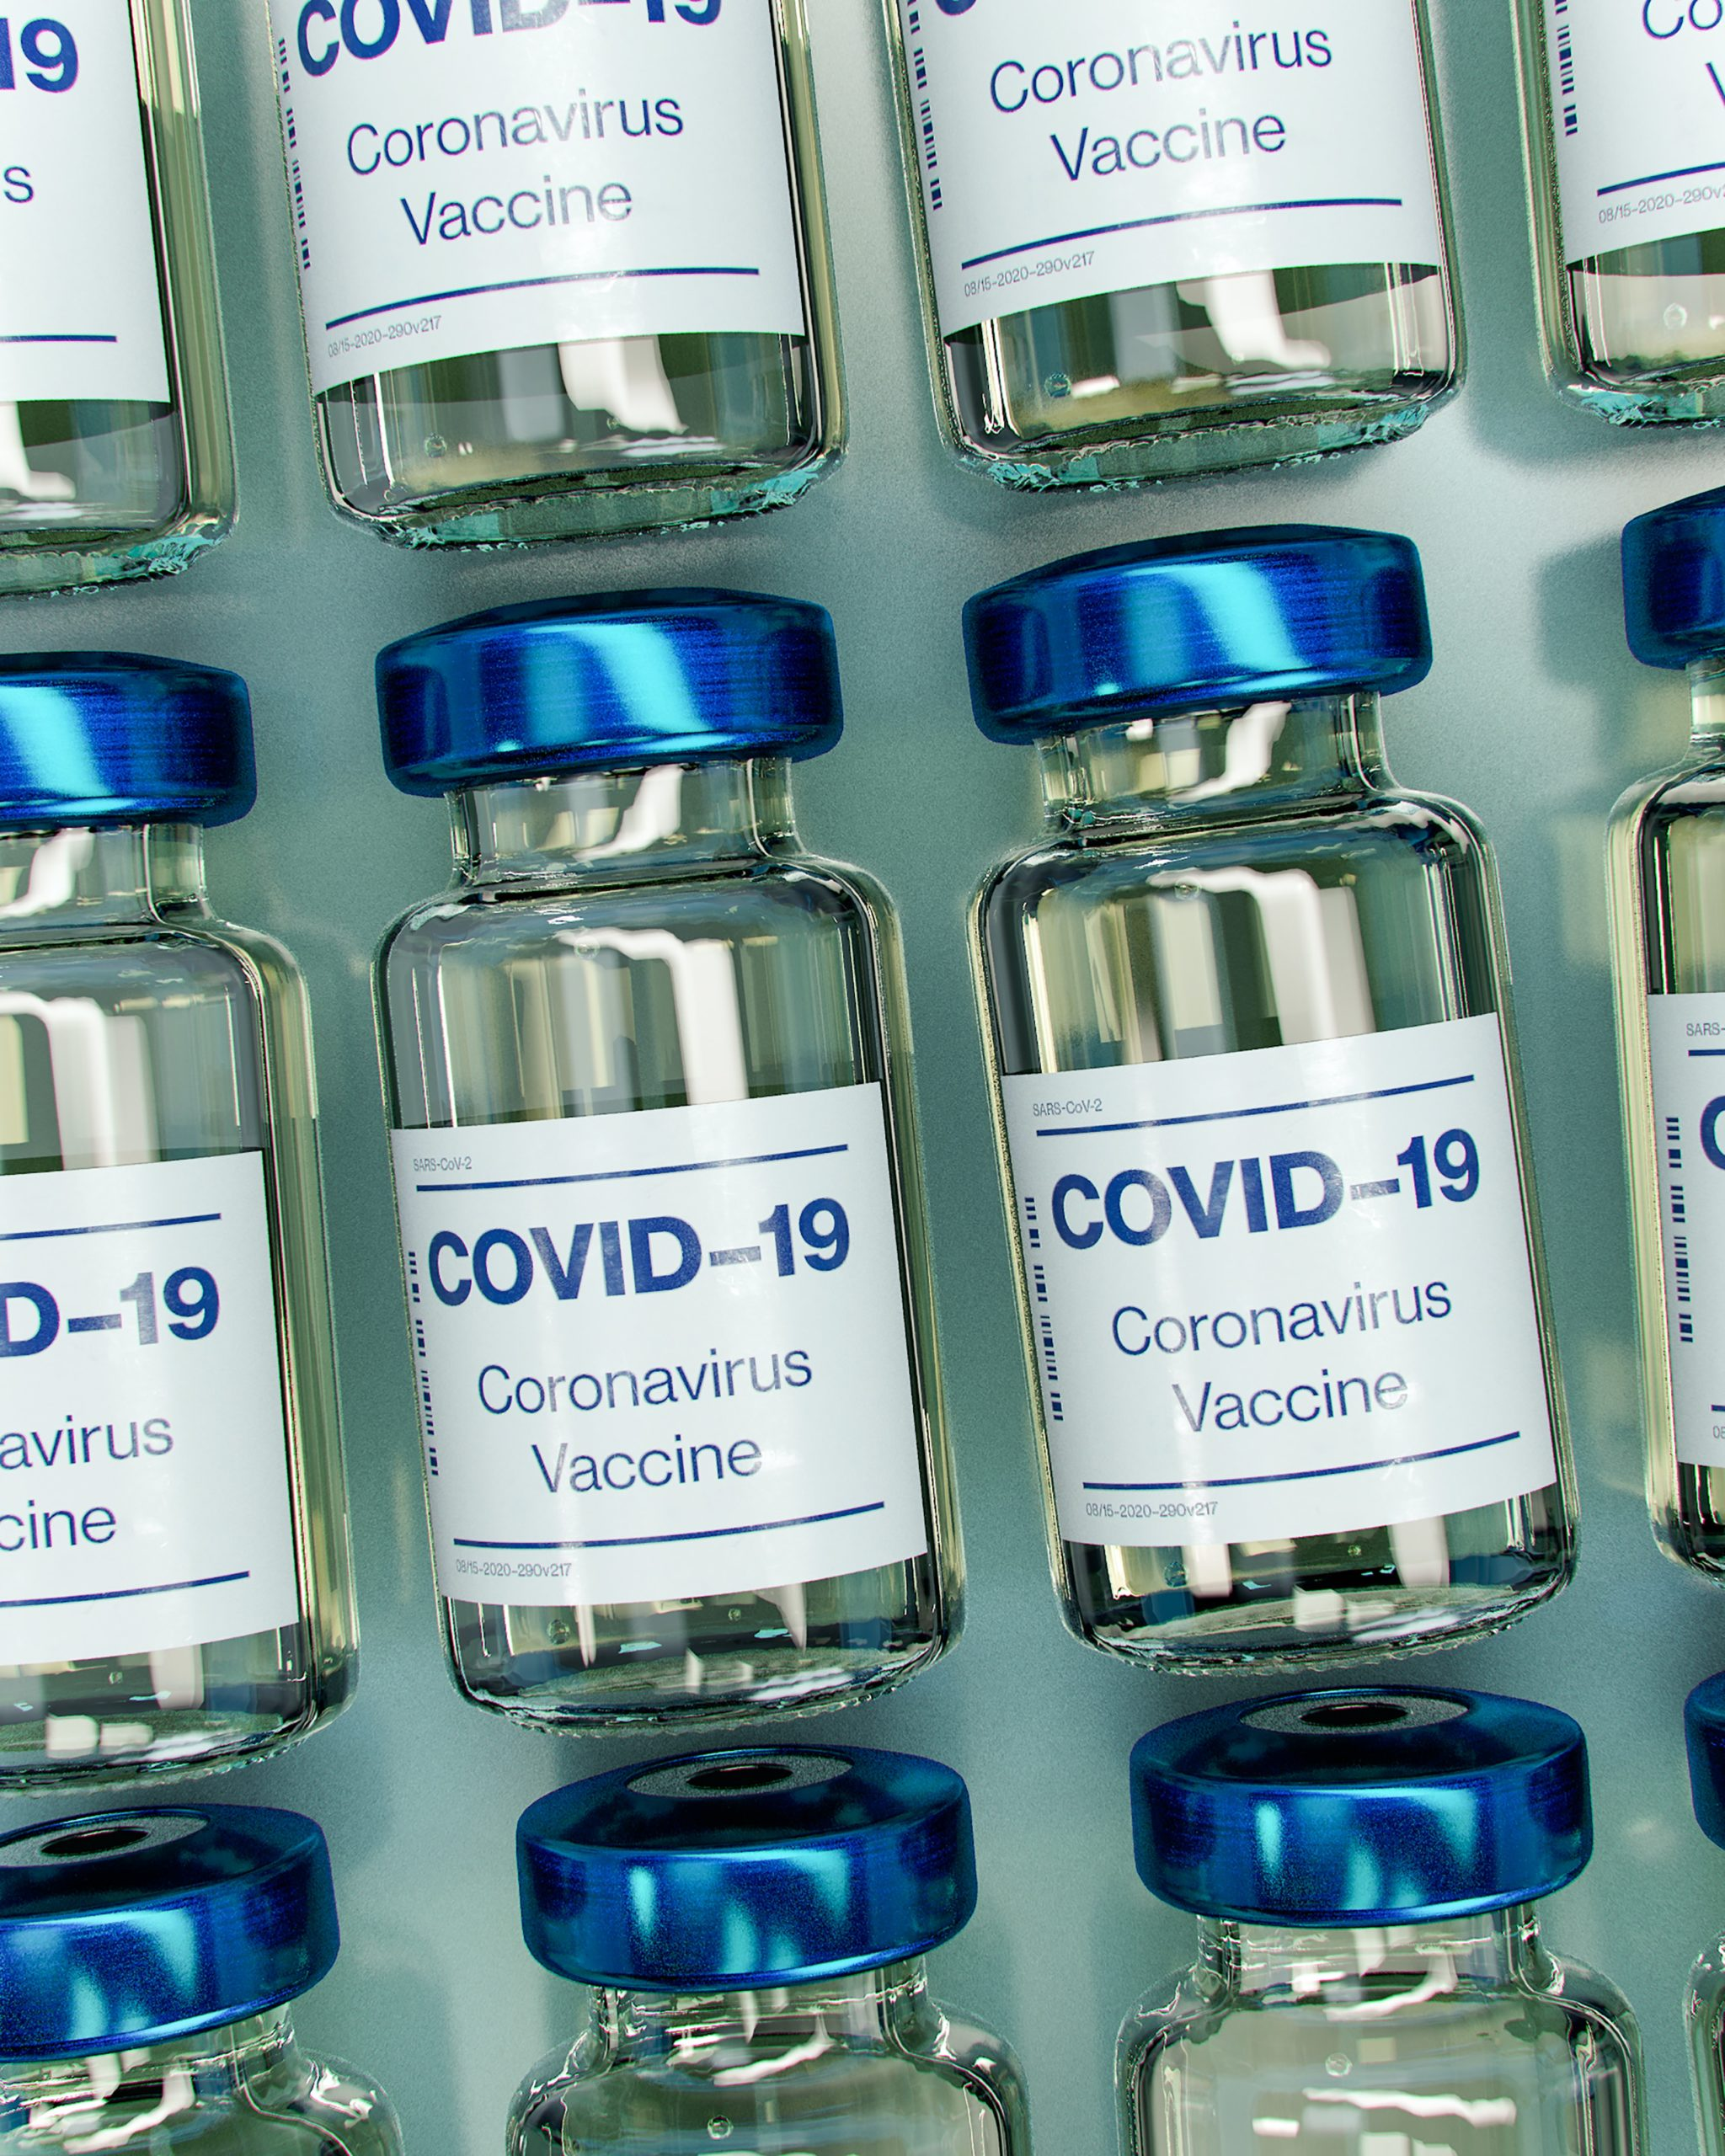 Troisième vaccination COVID